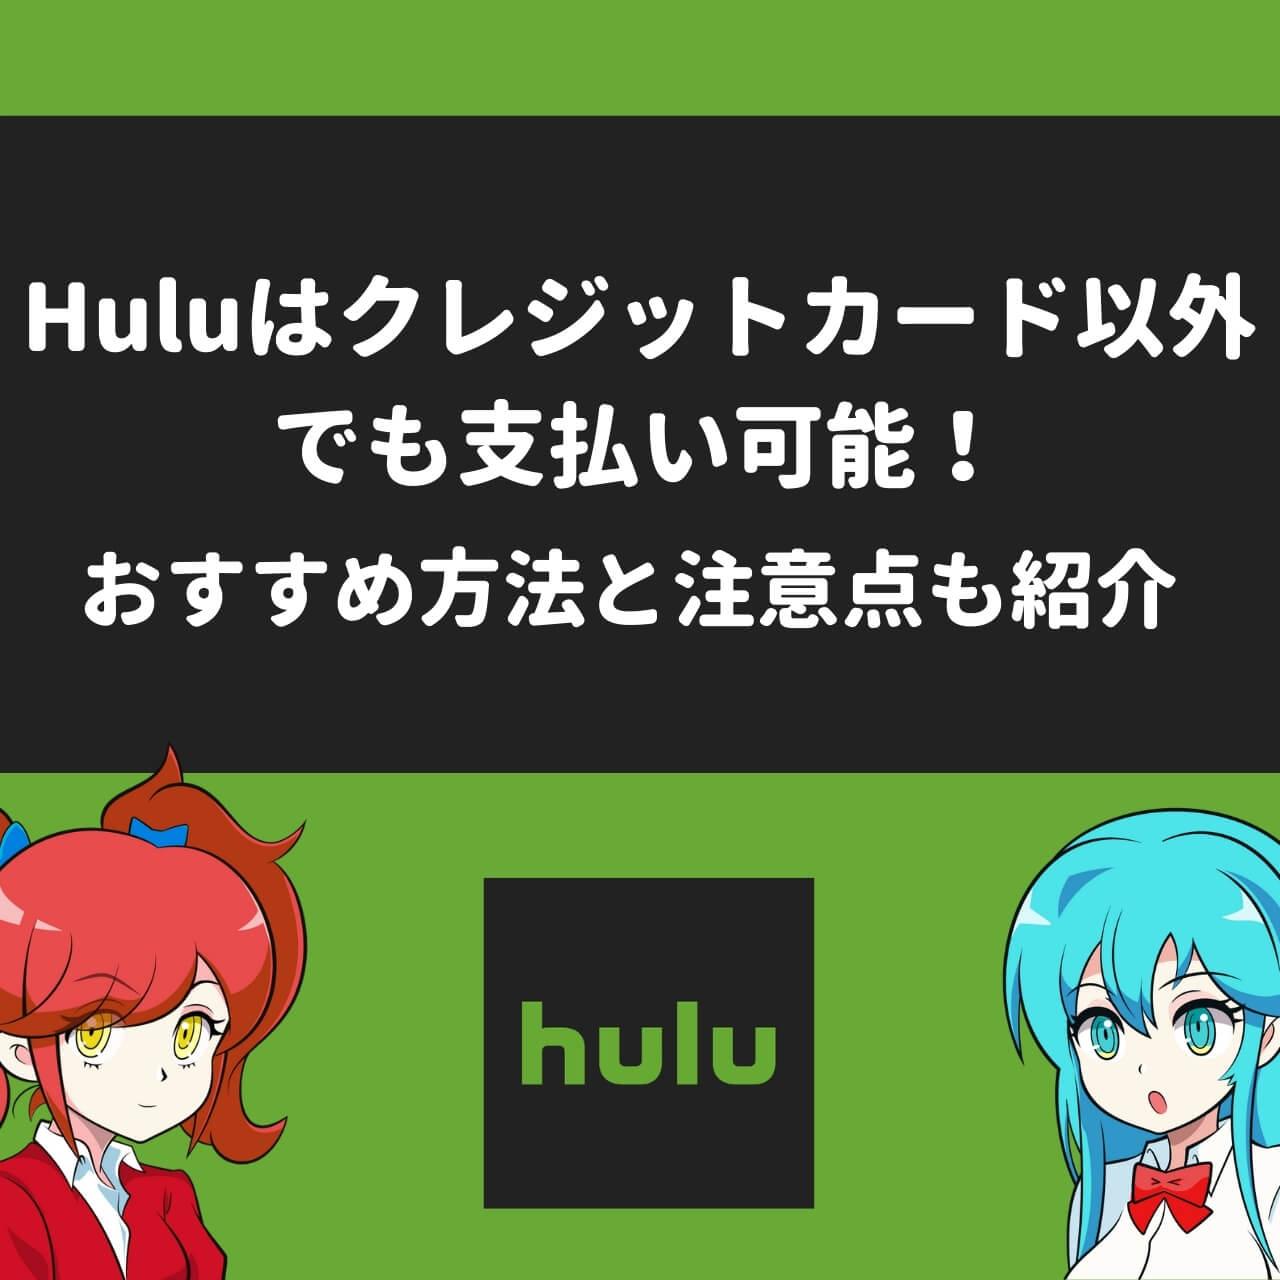 Huluはクレジットカード以外でも支払い可能!おすすめ方法と注意点も紹介